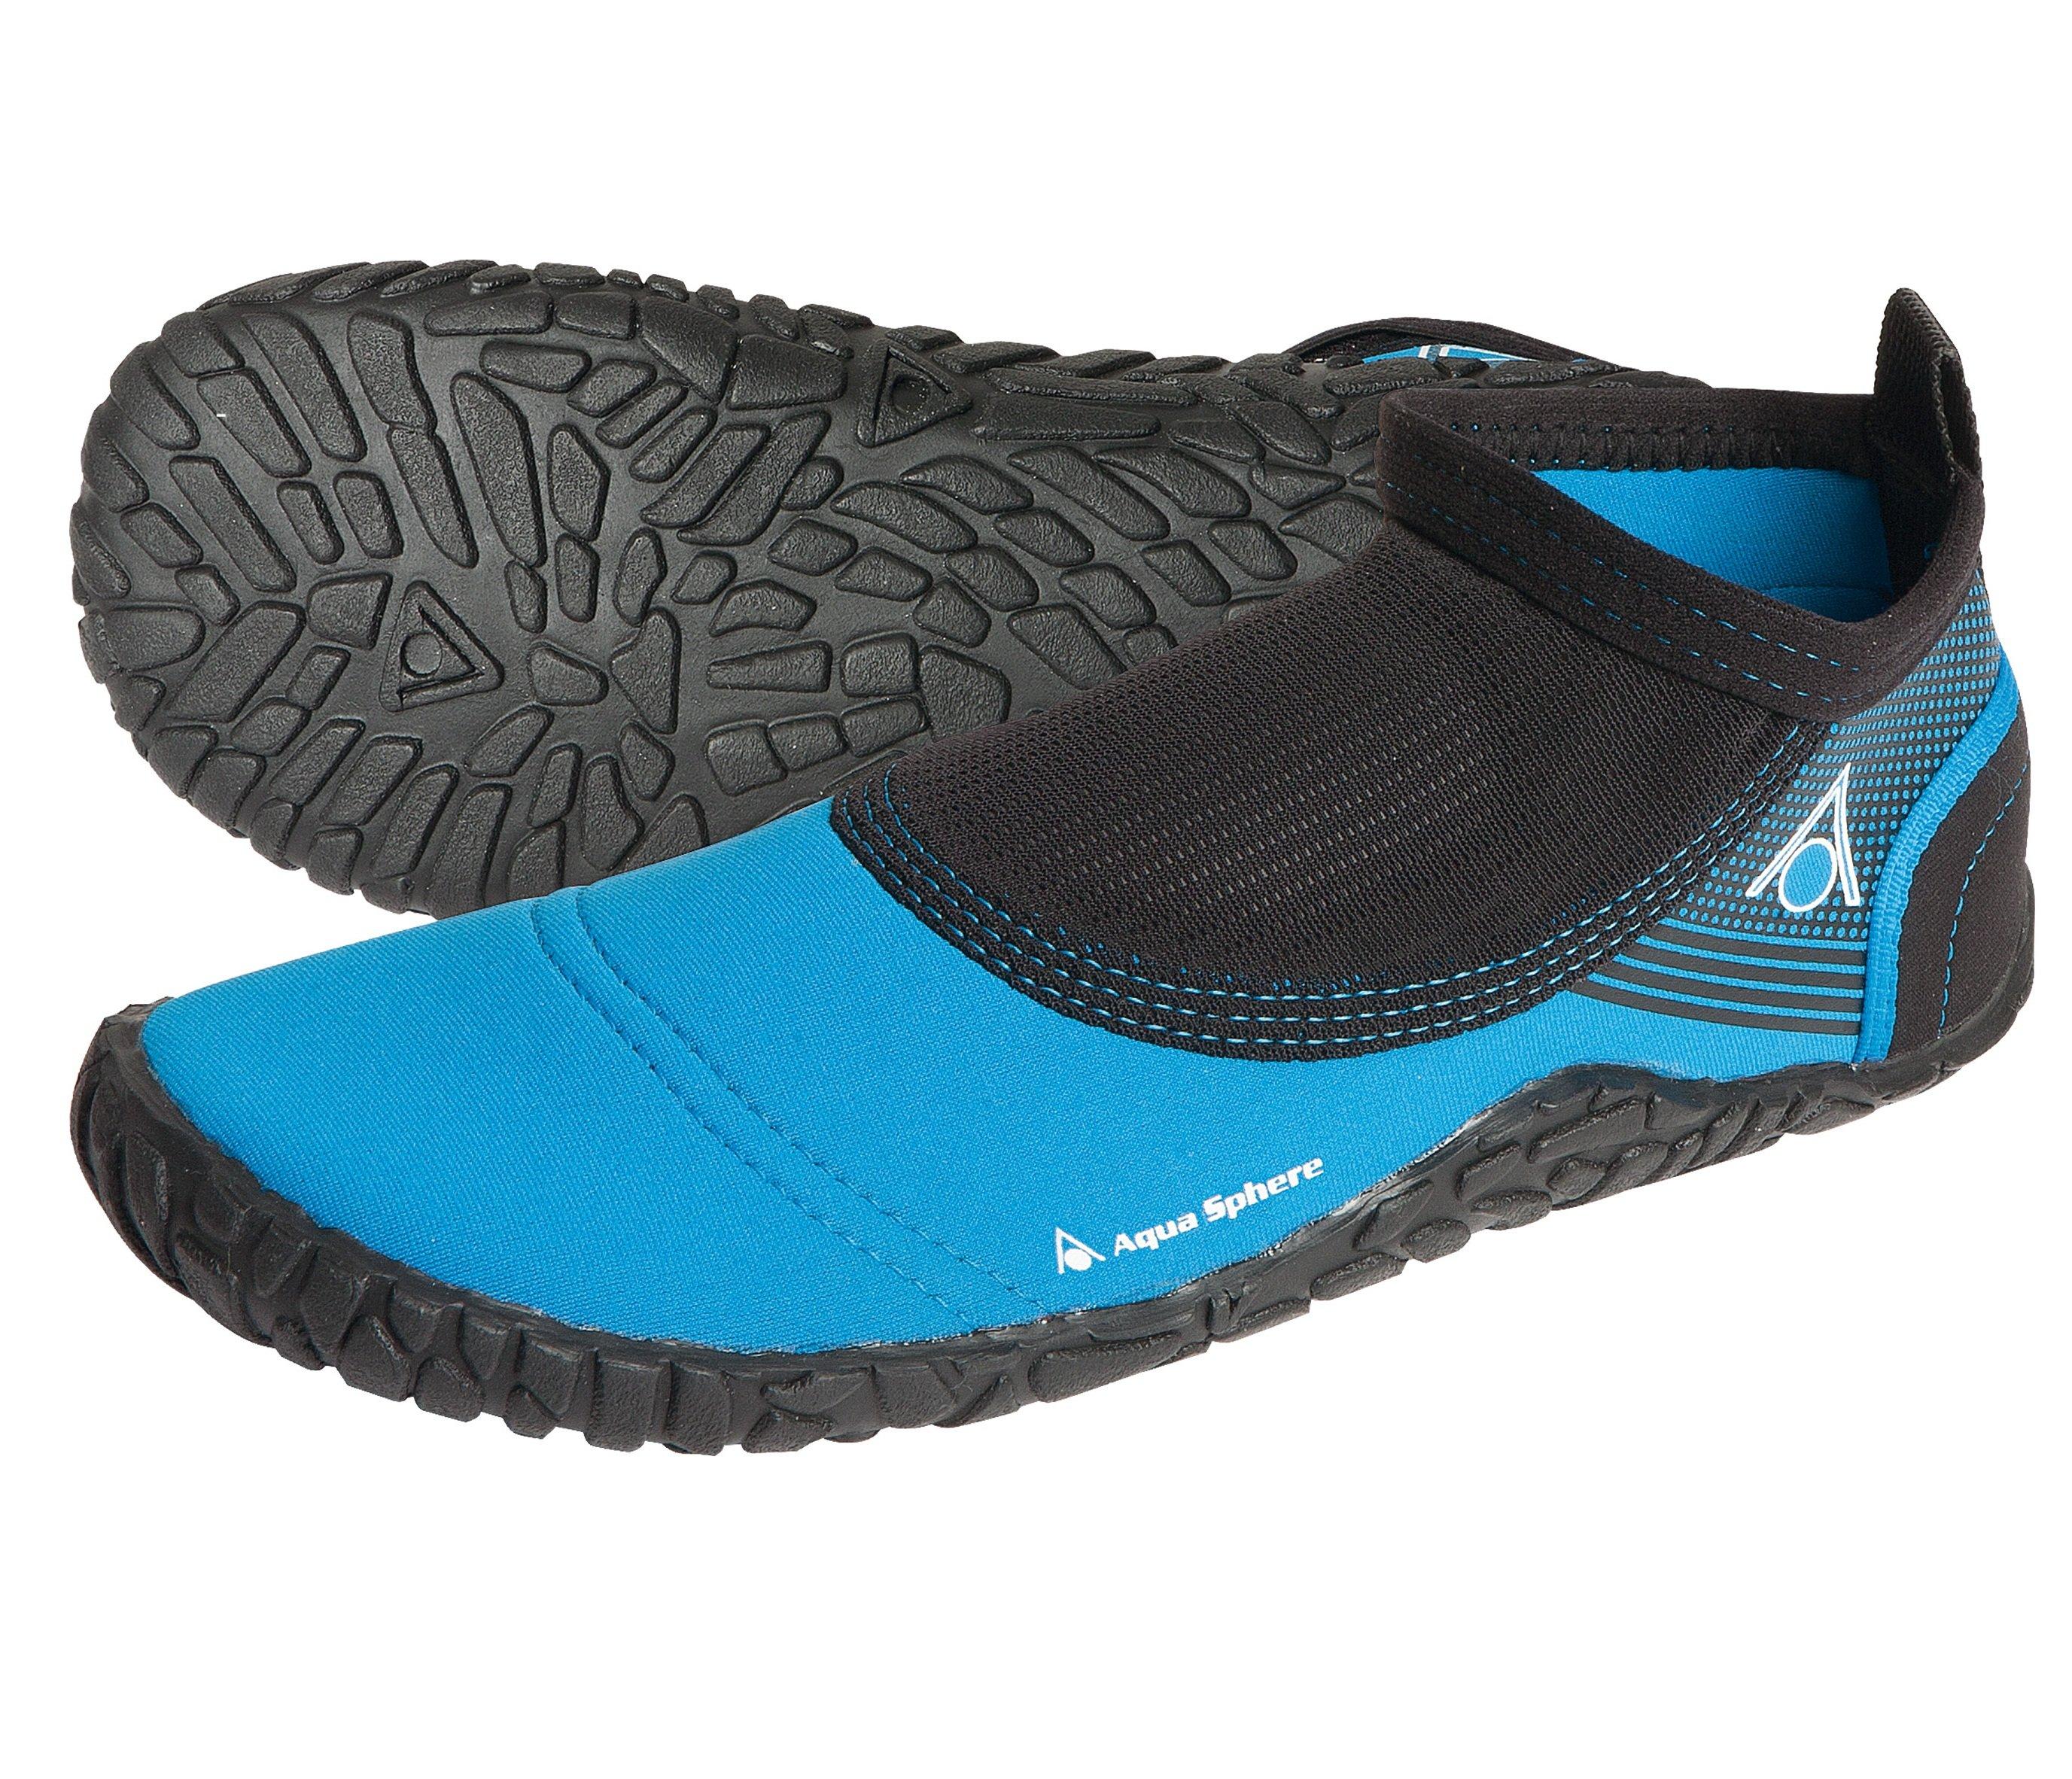 Plážové topánky BEACHWALKER 2.0  b9f5351d8fa